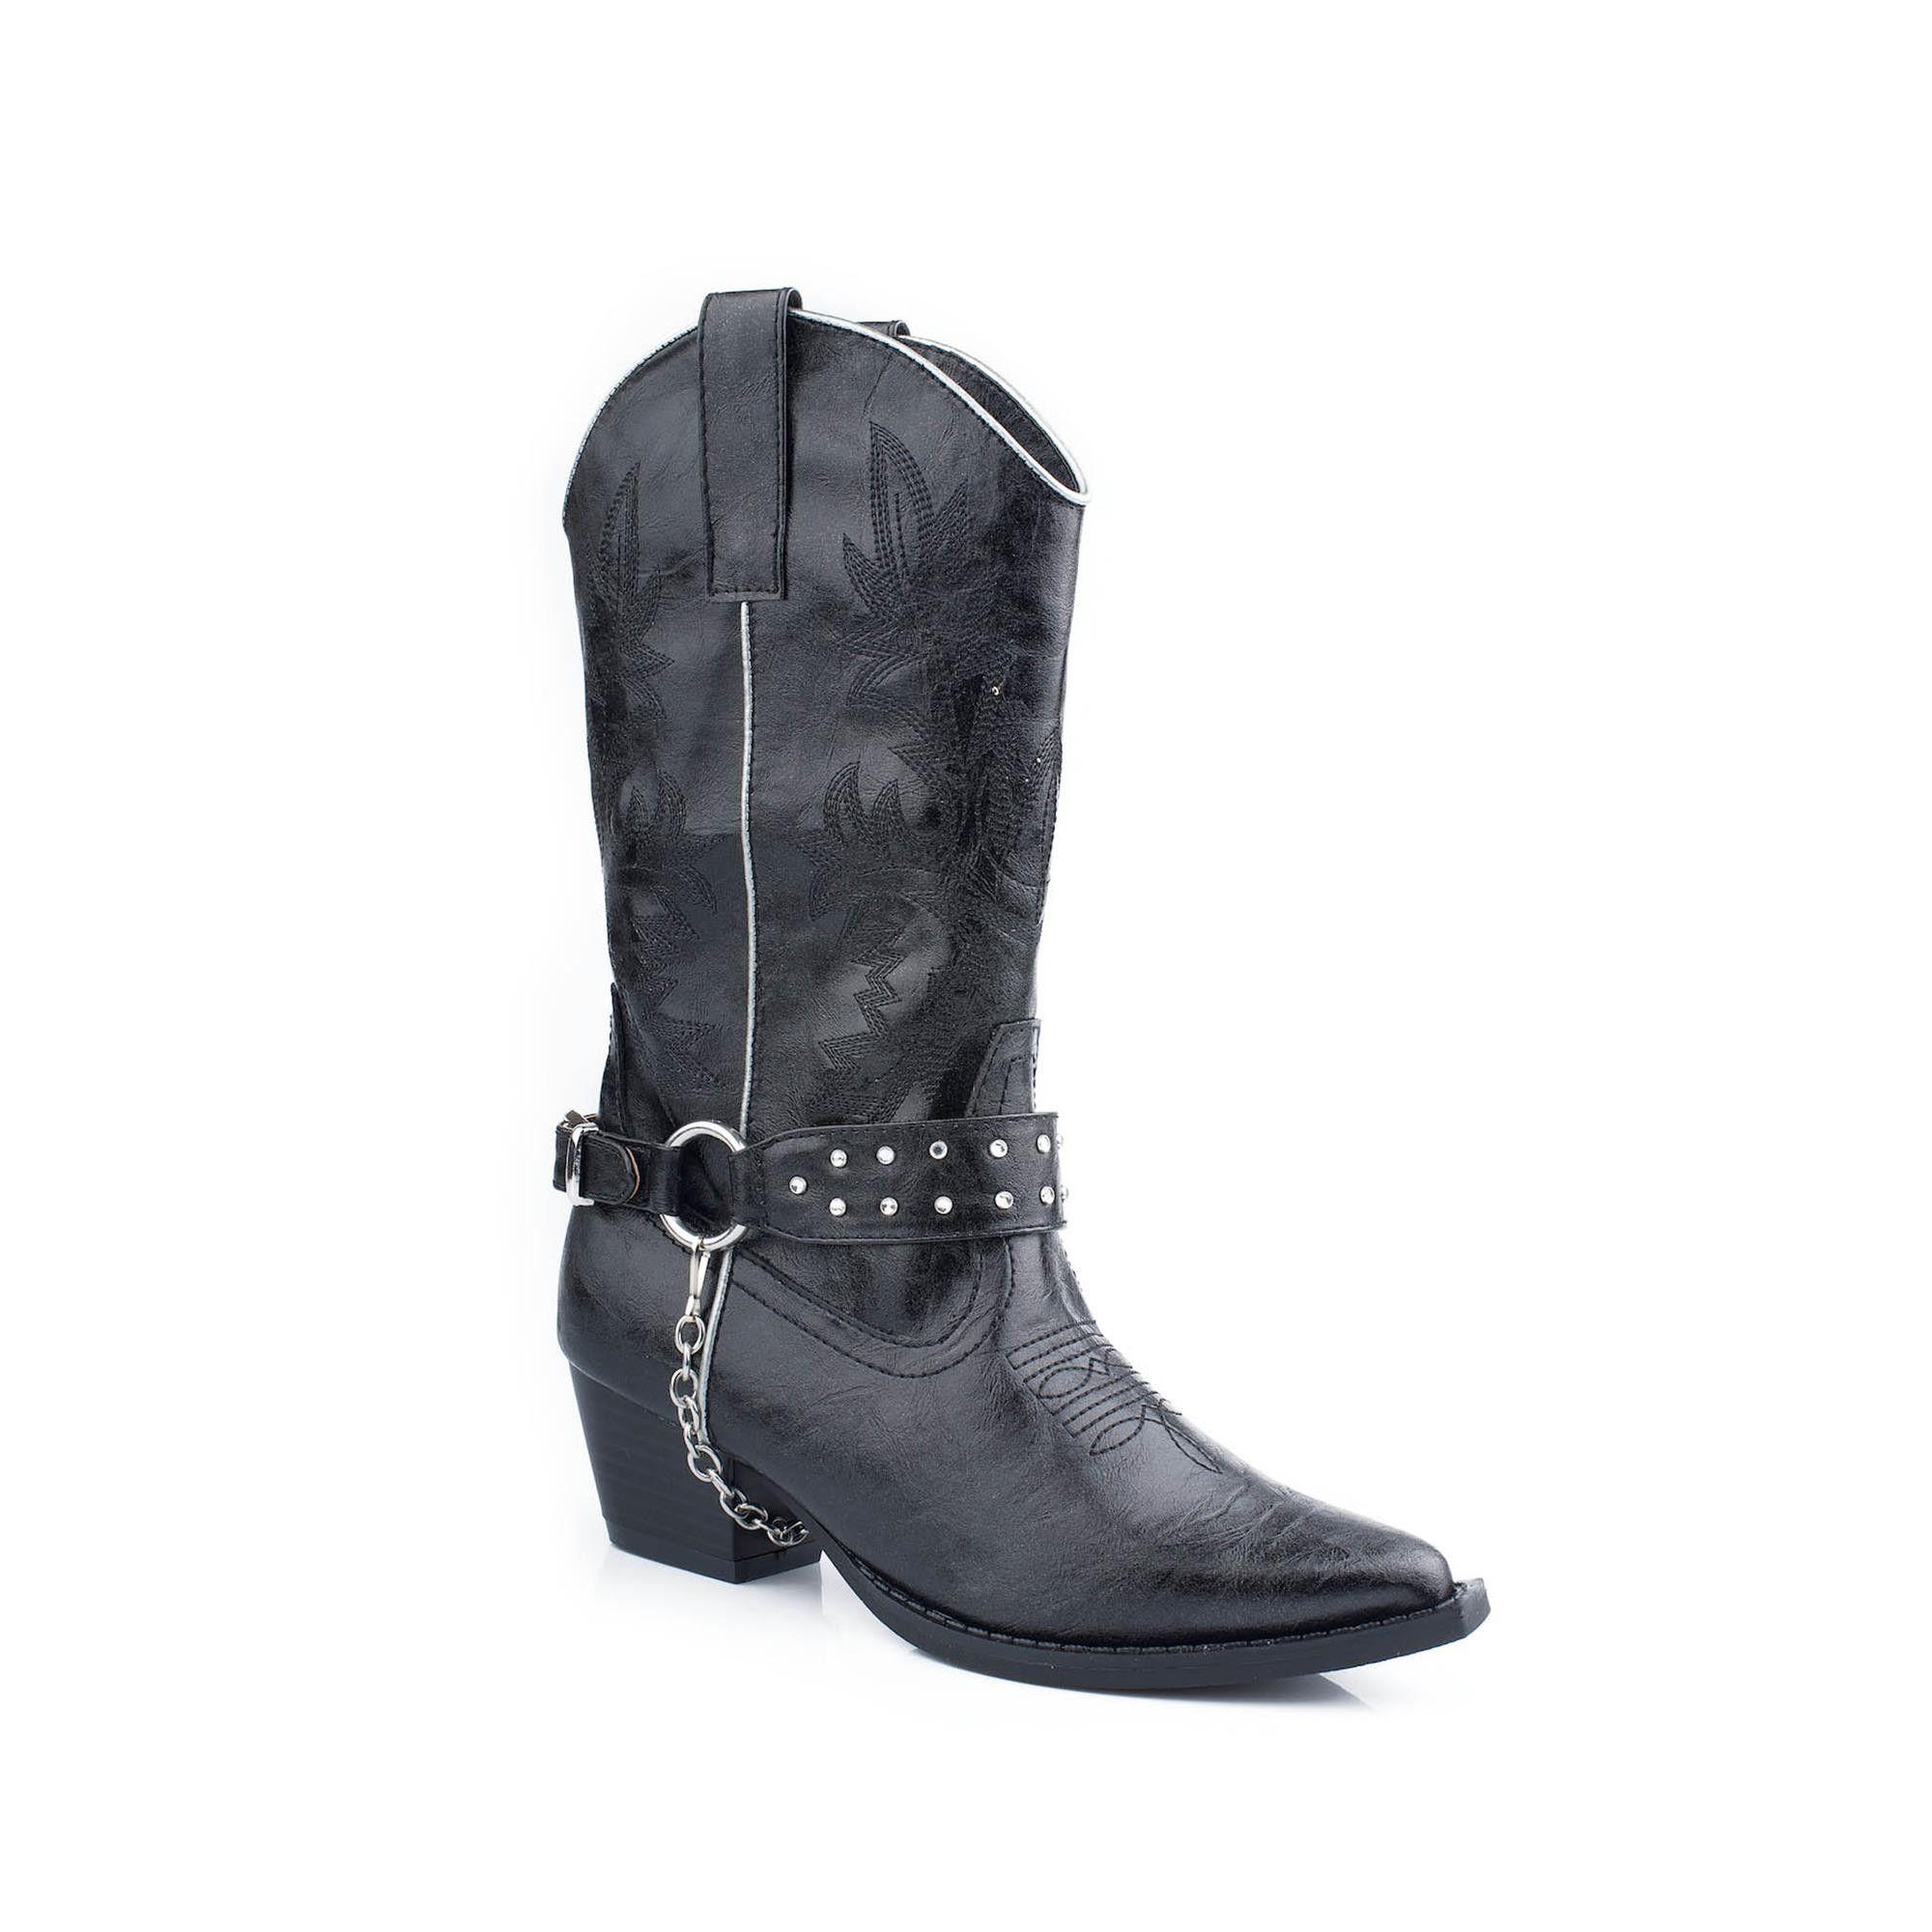 Fashion Faux Leather Boot Narrow Toe Silver - Black - Kids